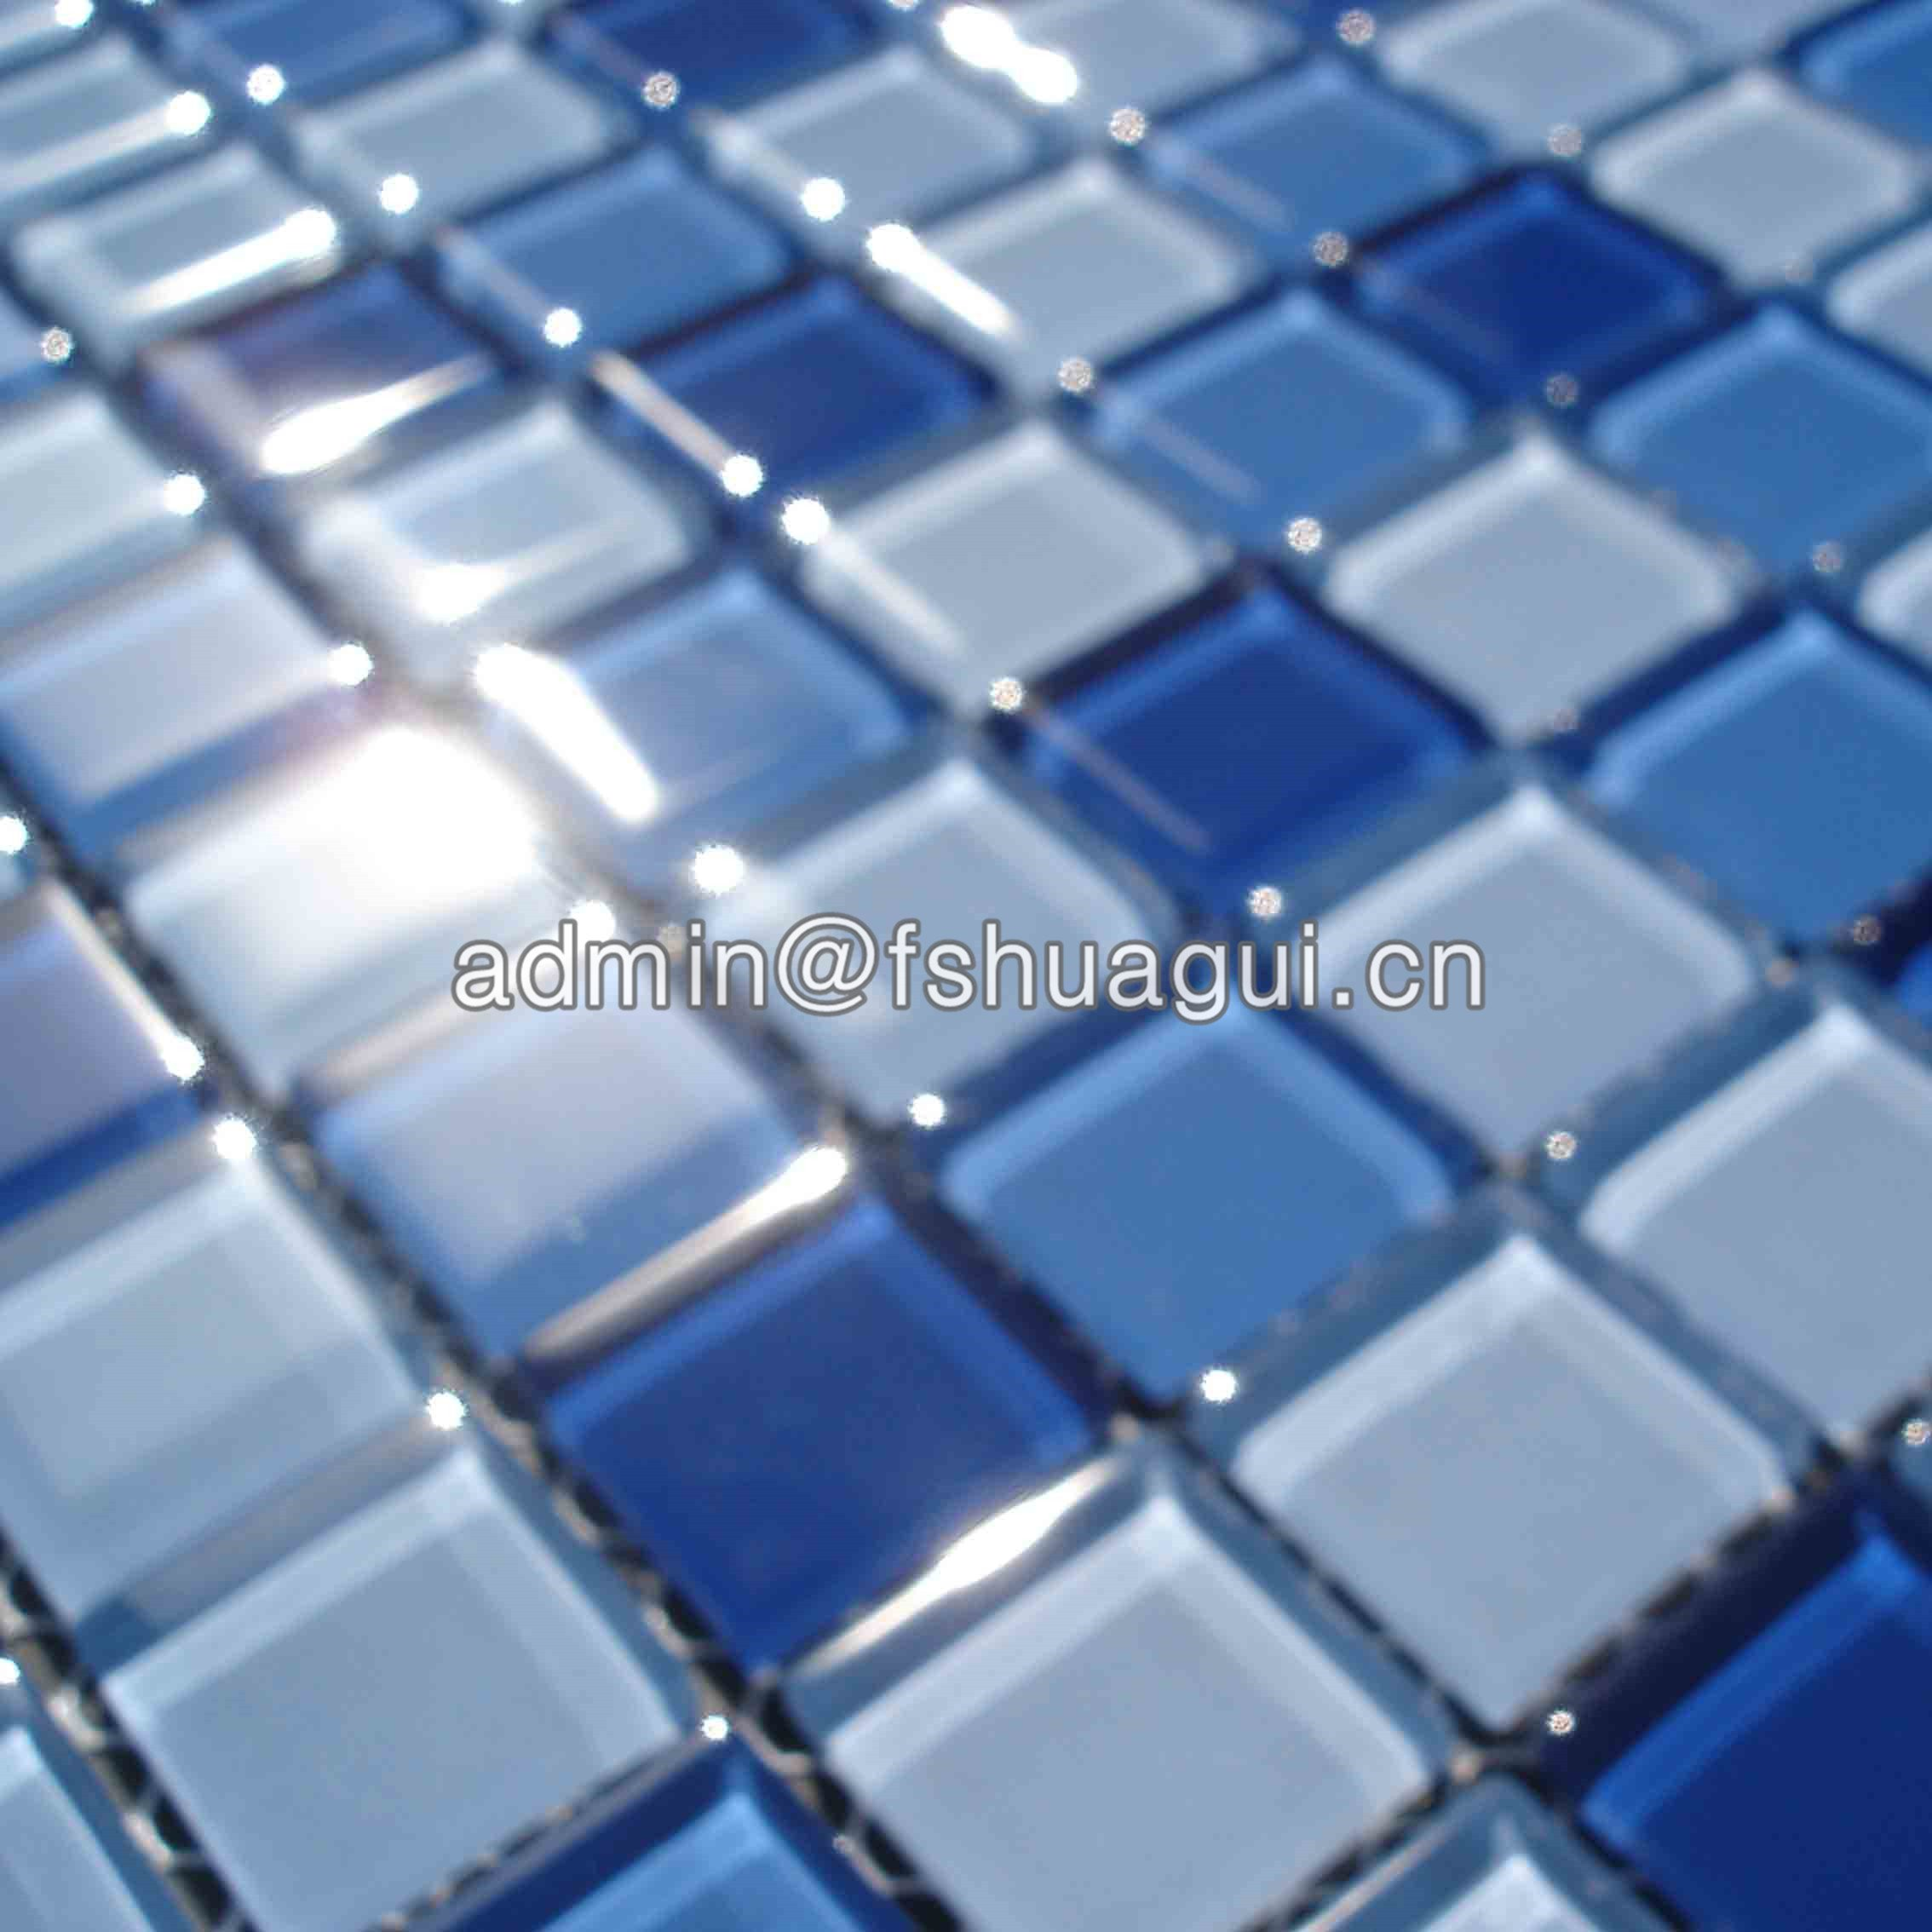 Huagui Blue swimming pool crystal glass mosaic tiles for swimming pools HG-423008 POOL MOSAIC TILE image14